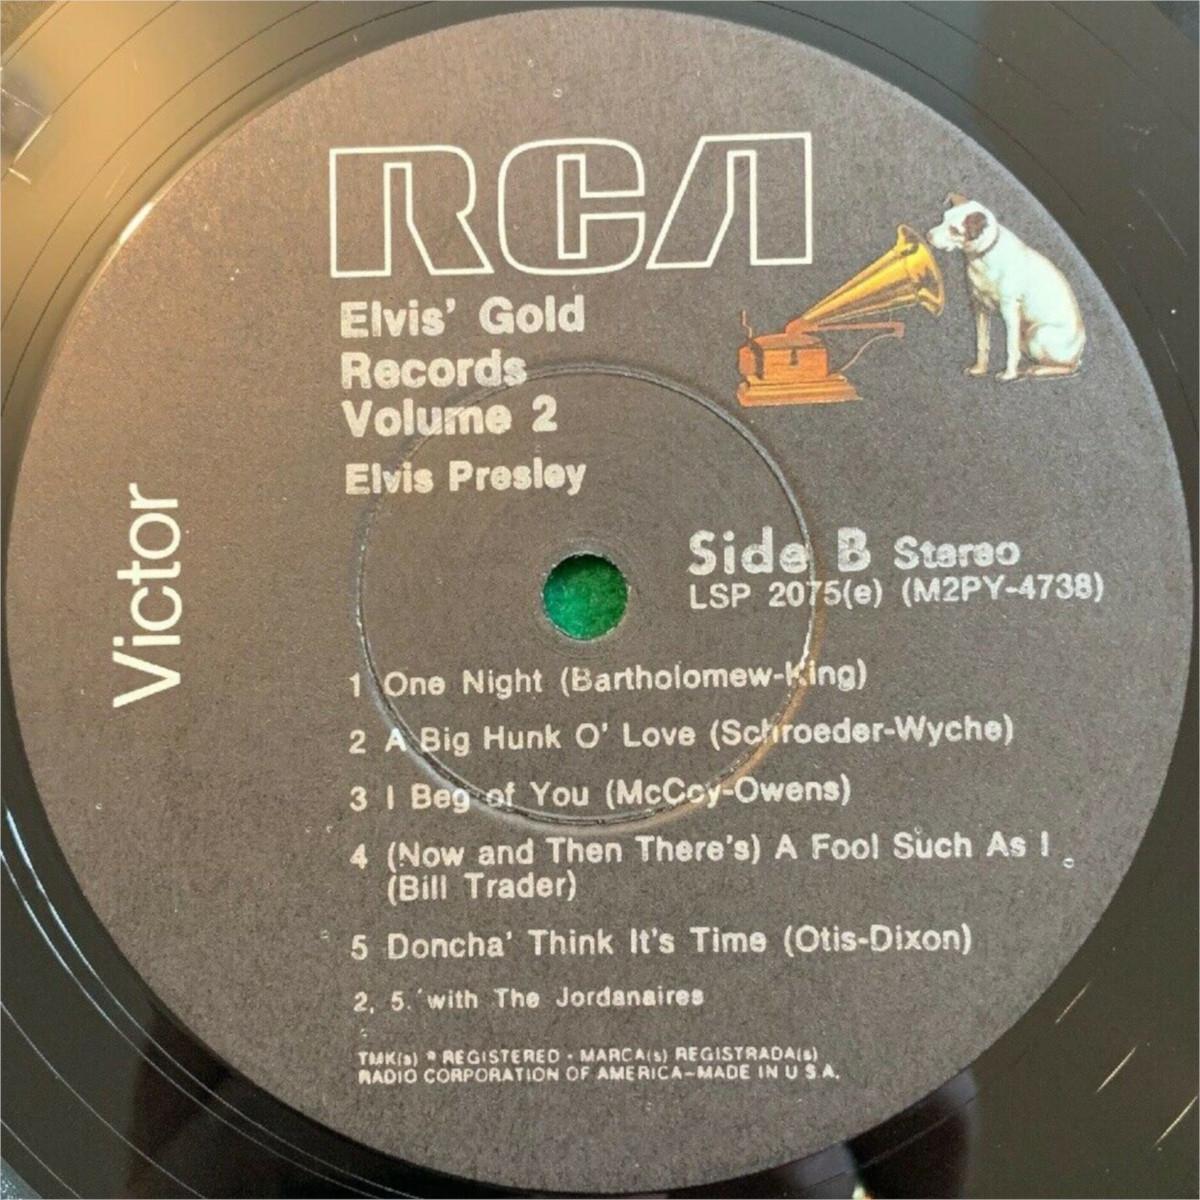 ELVIS' GOLD RECORDS VOL 2 Lsp-2075e-76-4ytj6r